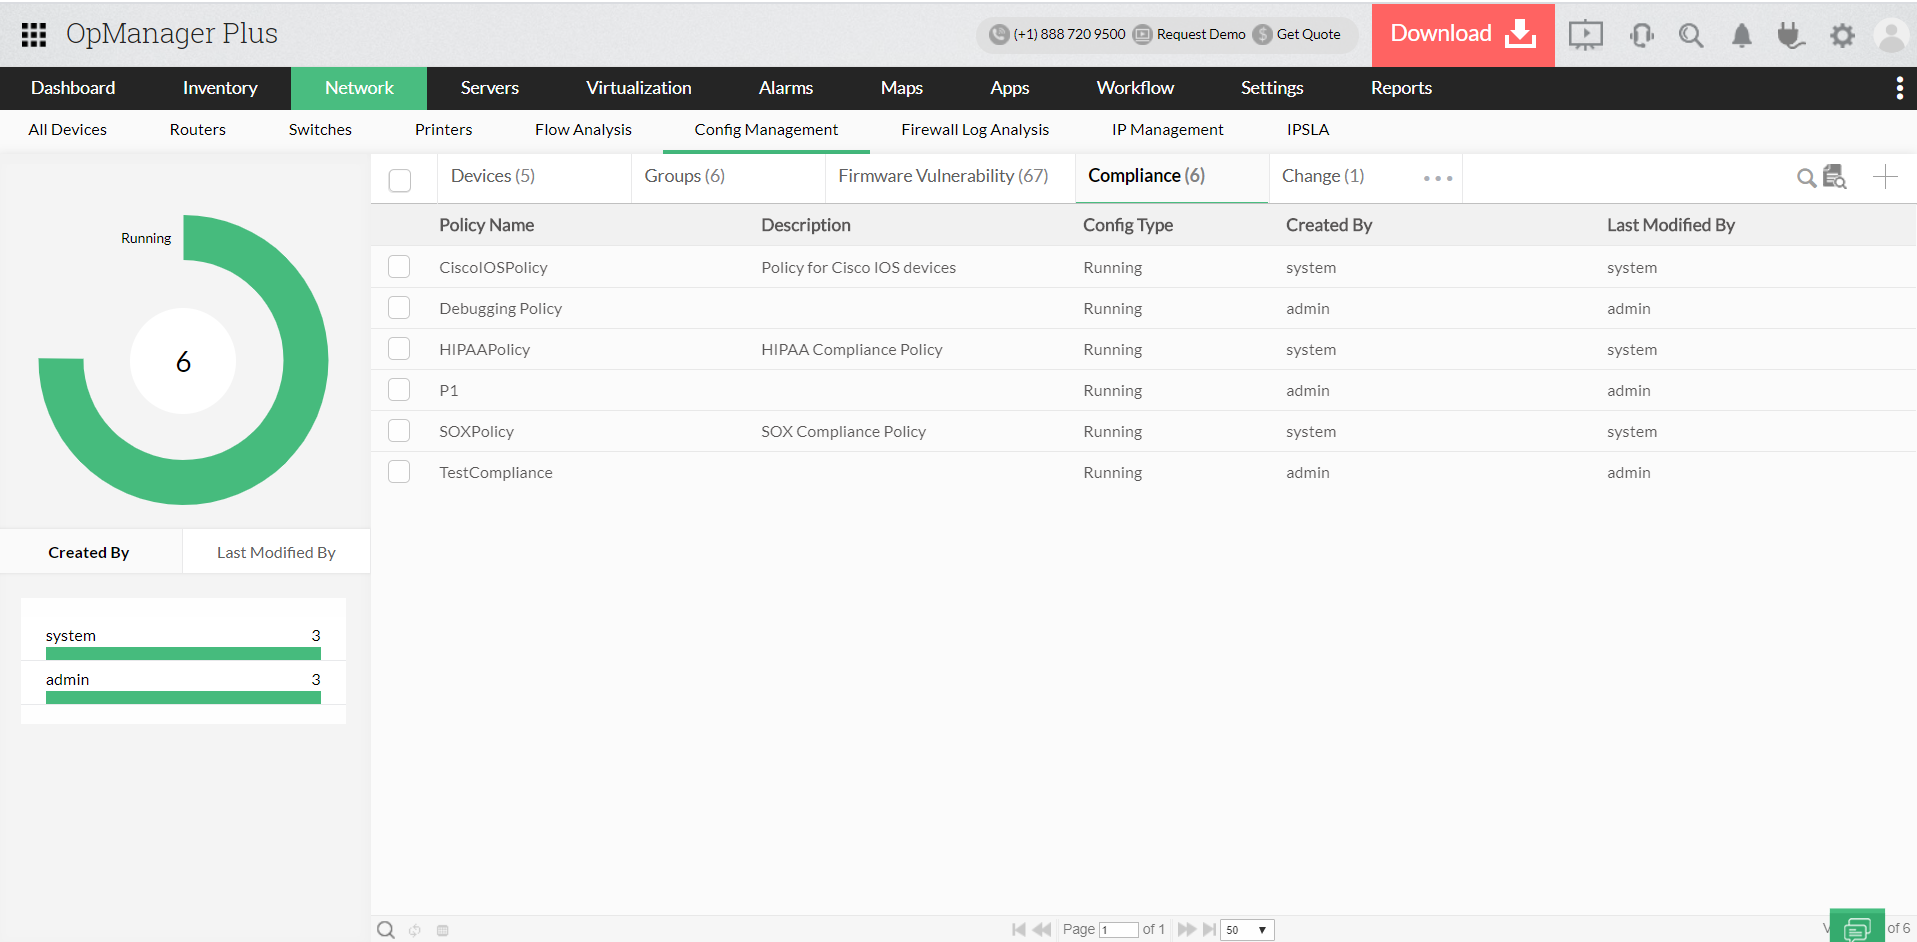 Мониторинг соответствия требованиям - ManageEngine OpManager Plus